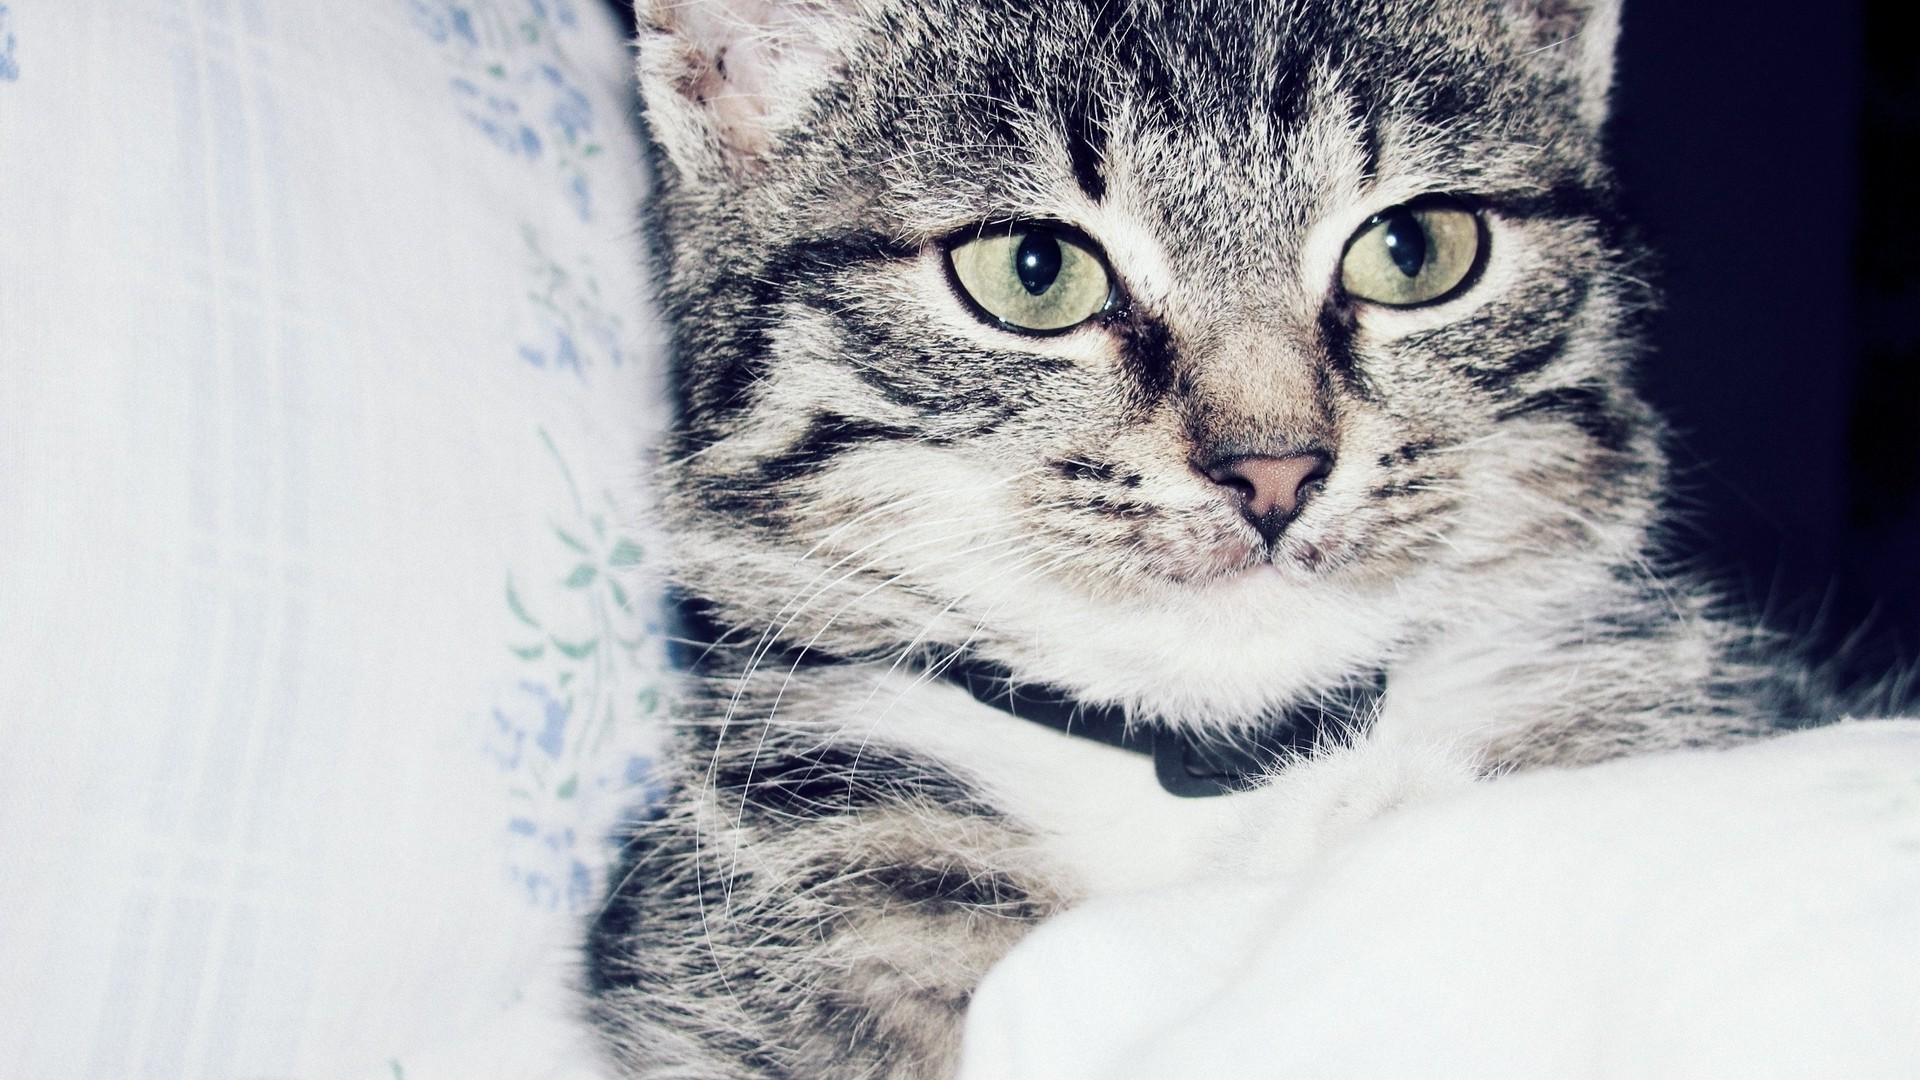 White Cat Animals Whiskers Kitten Mammal 1920x1080 Px Vertebrate Close Up Like Small To